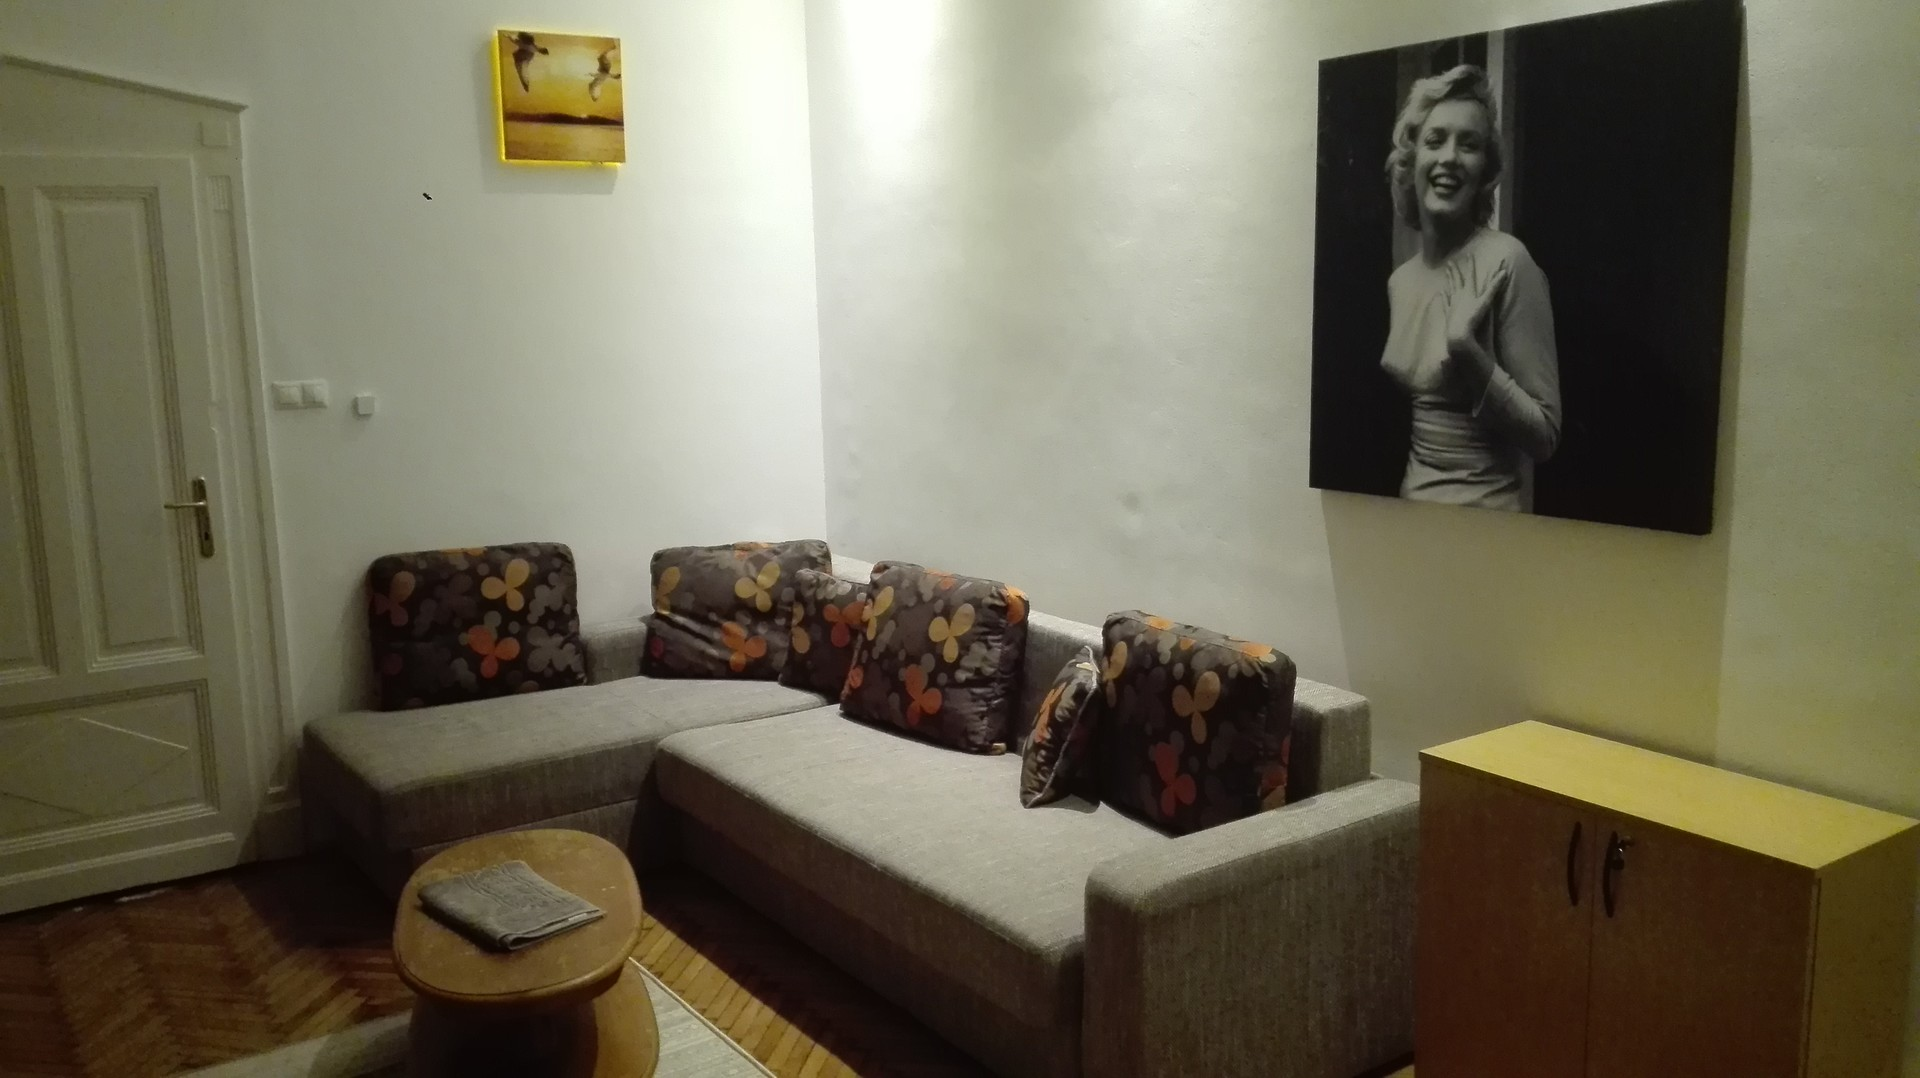 brand-new-refurbished-modern-elegant-apartment-located-right-heart-city-17214c926f2954002f7b96cb904f3bc6